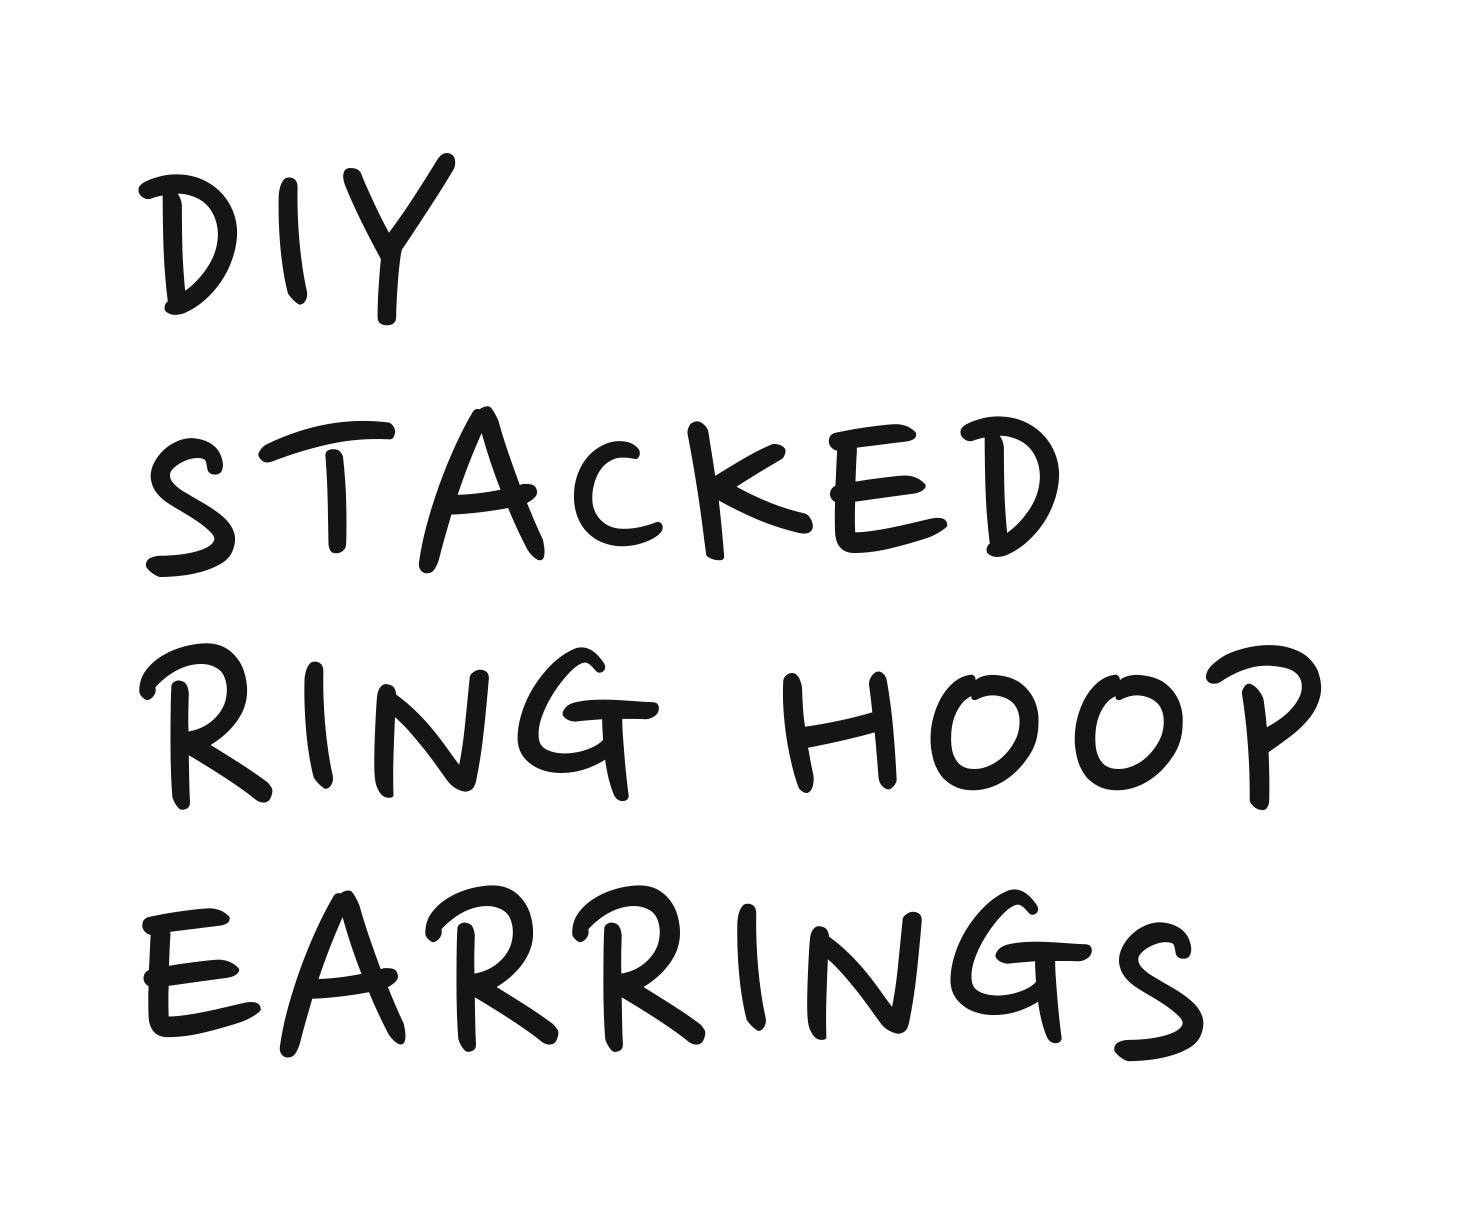 StackedRingHoopEarringsBlock.png